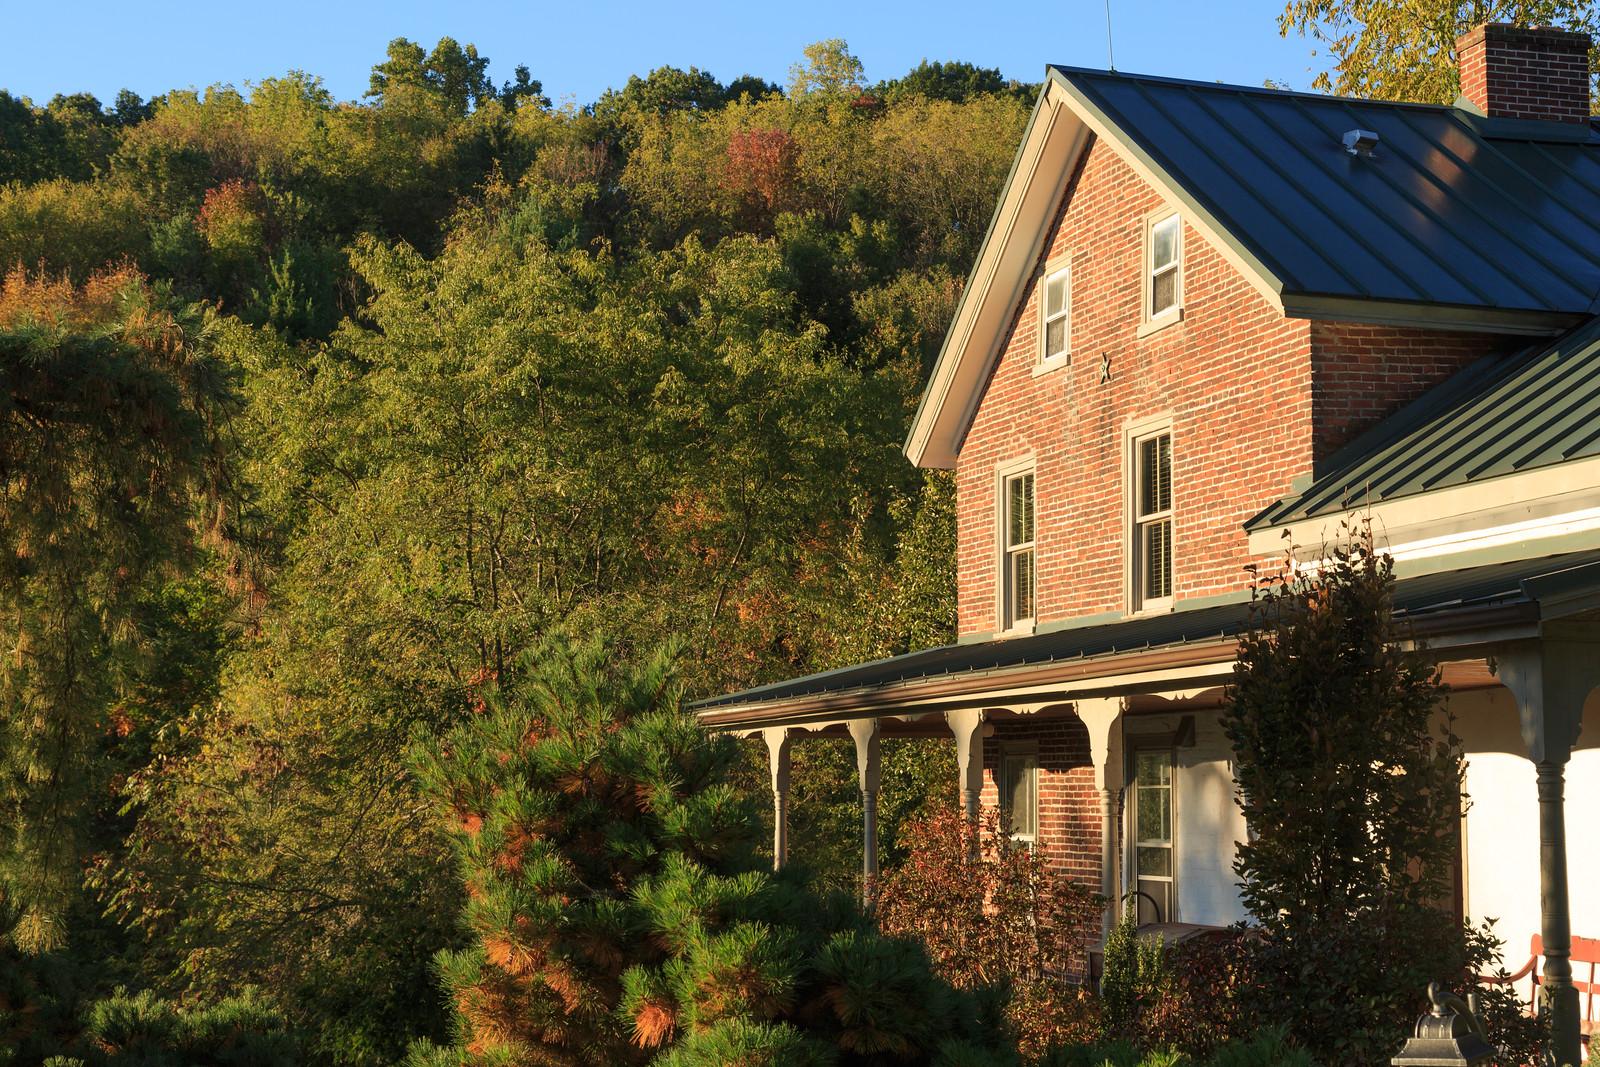 Glasbern | Fogelsville, PA 18051